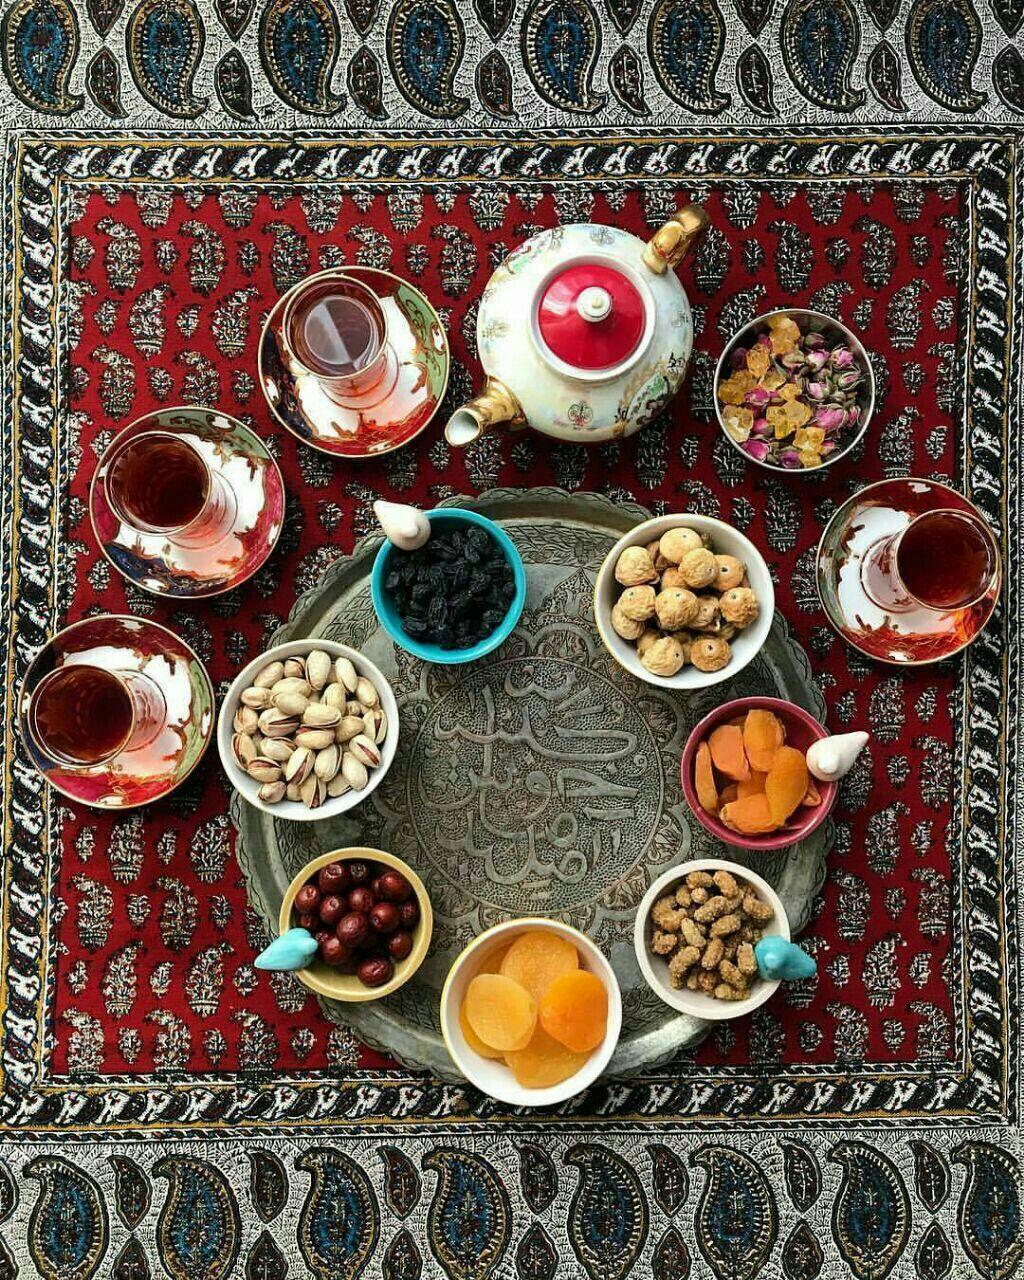 картинки египетское чаепитие два дня